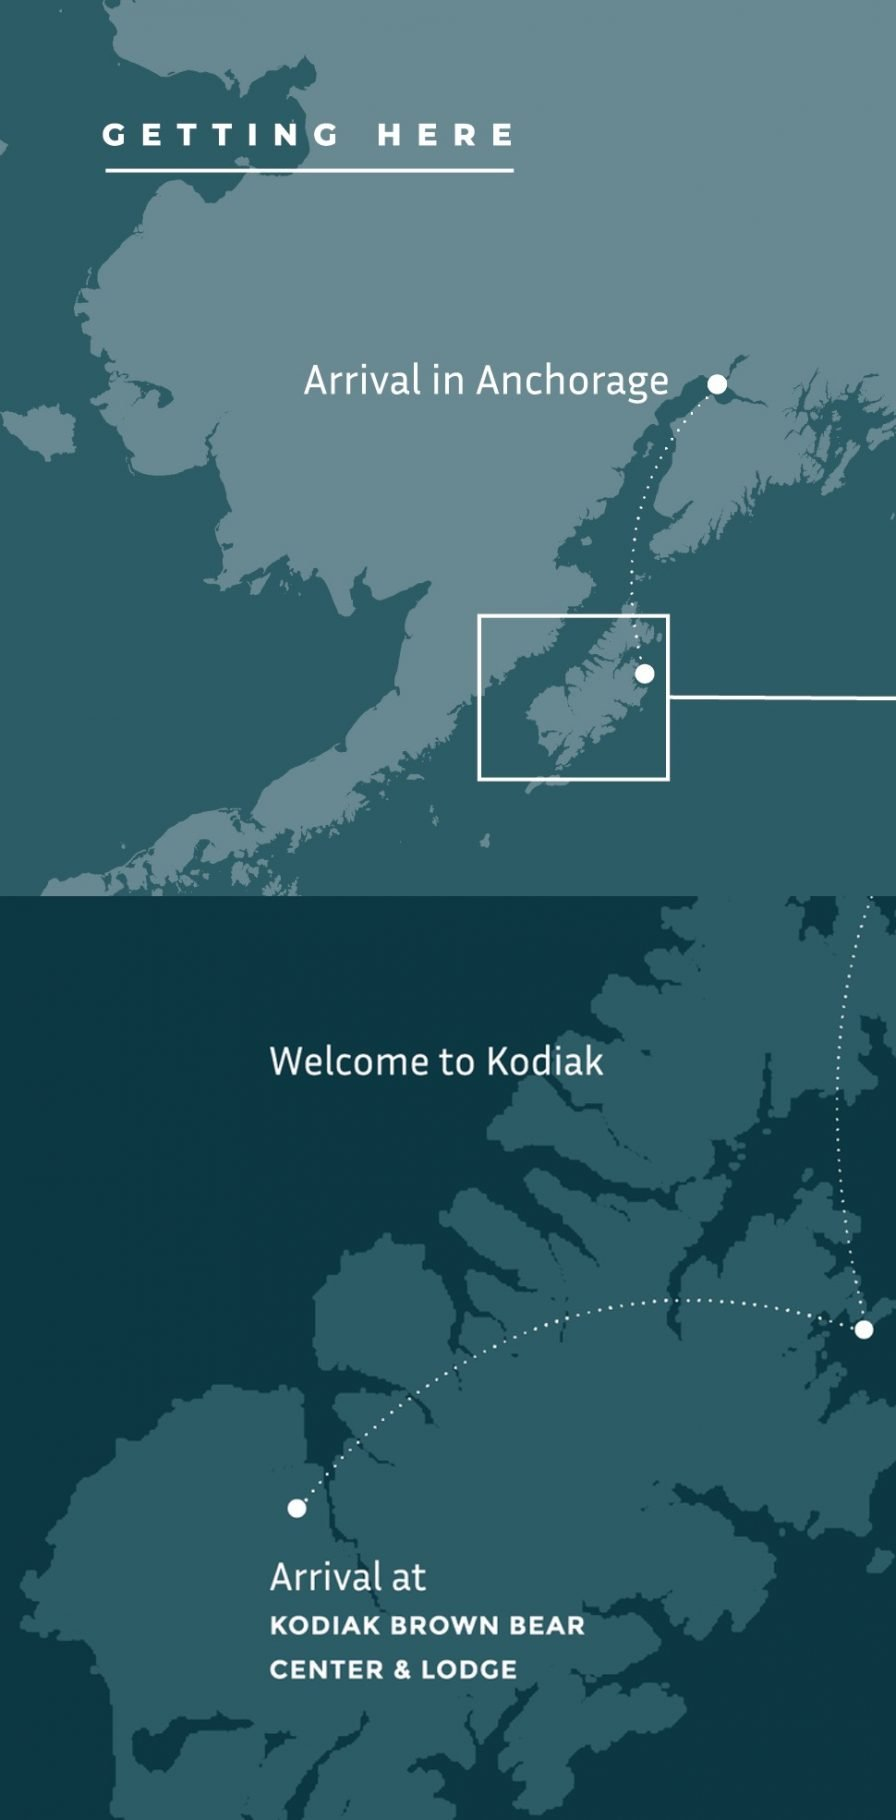 Getting to Kodiak map